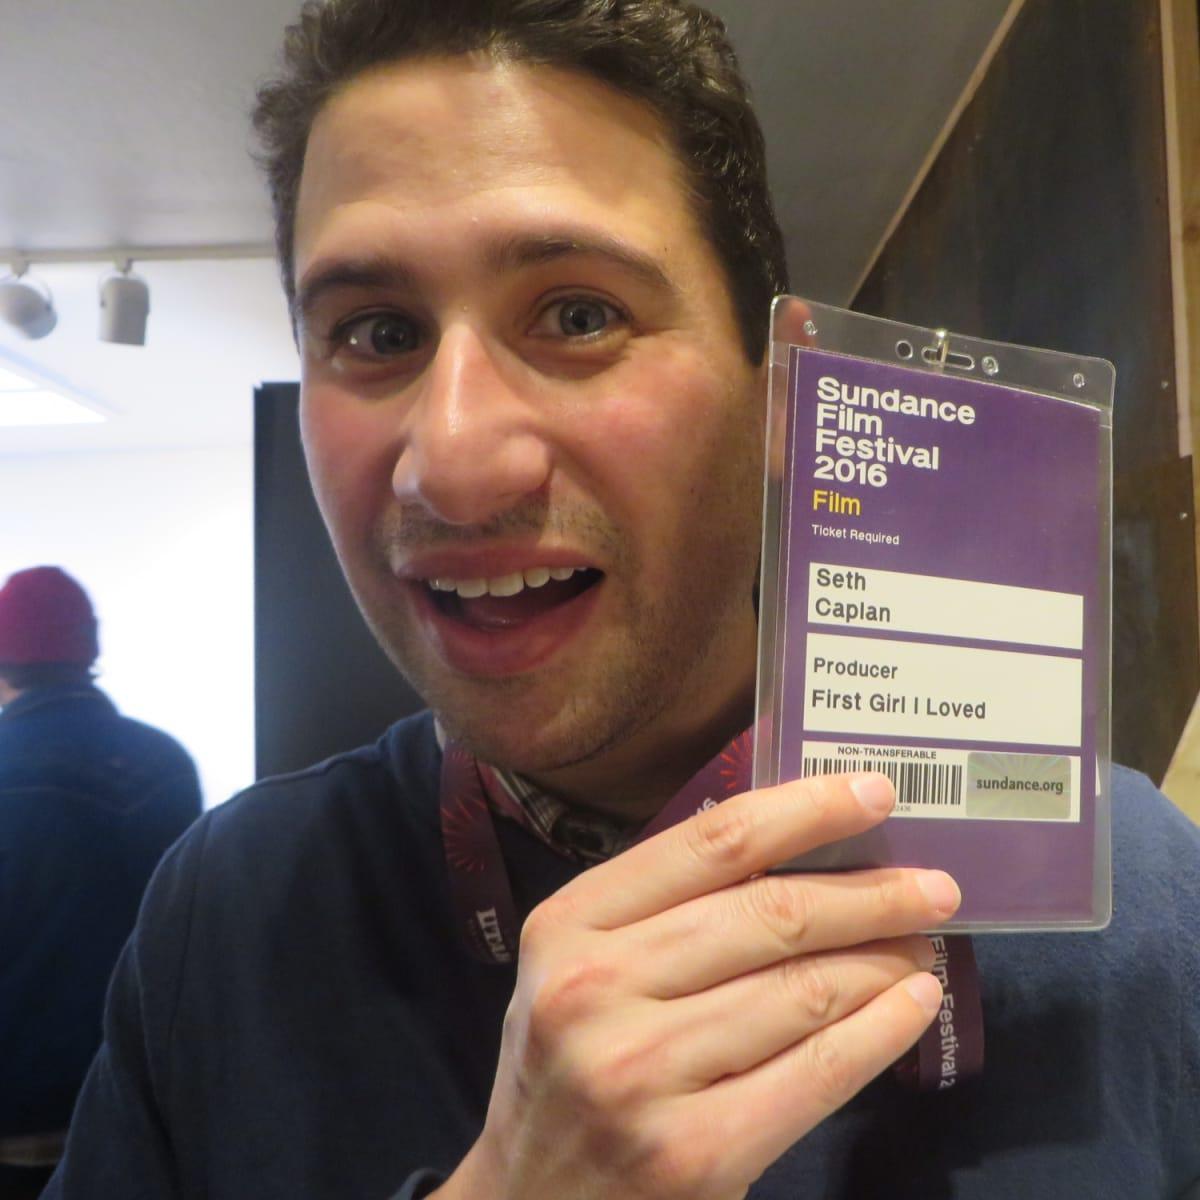 Seth Caplan at Film Texas reception at Sundance Film Festival